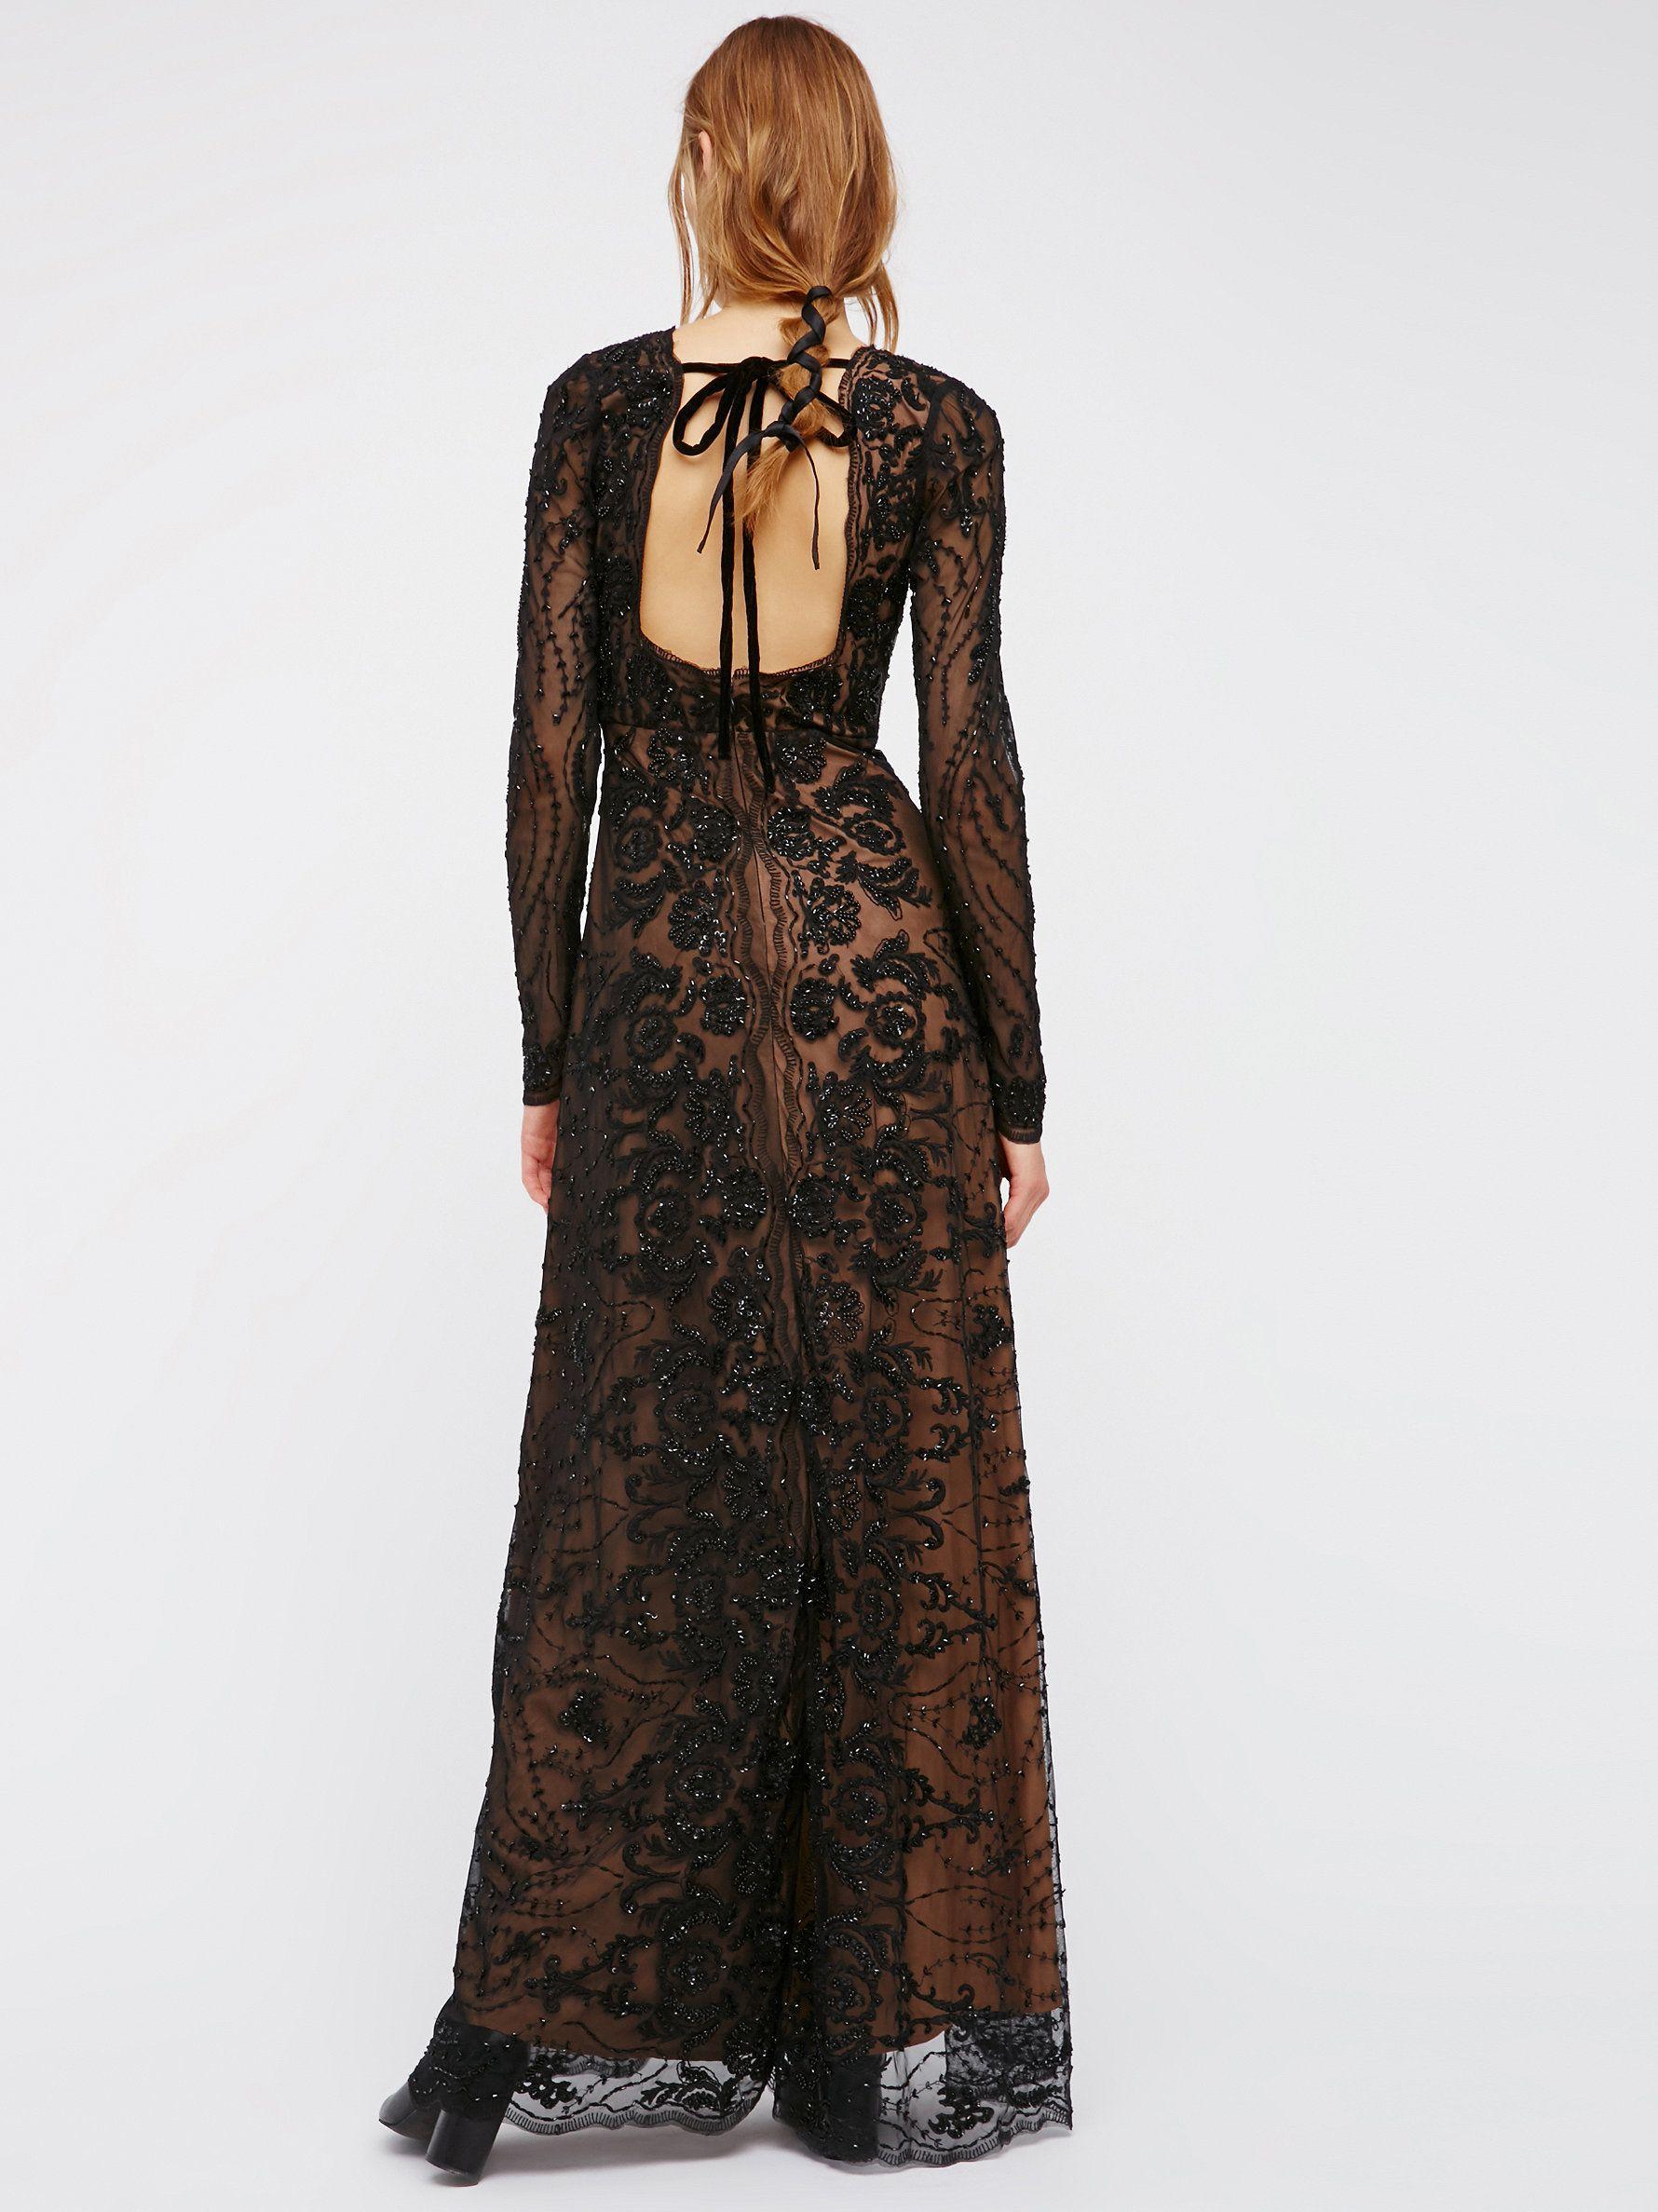 Keenan\'s Limited Edition Holiday Dress | Maxi Dress | Pinterest ...